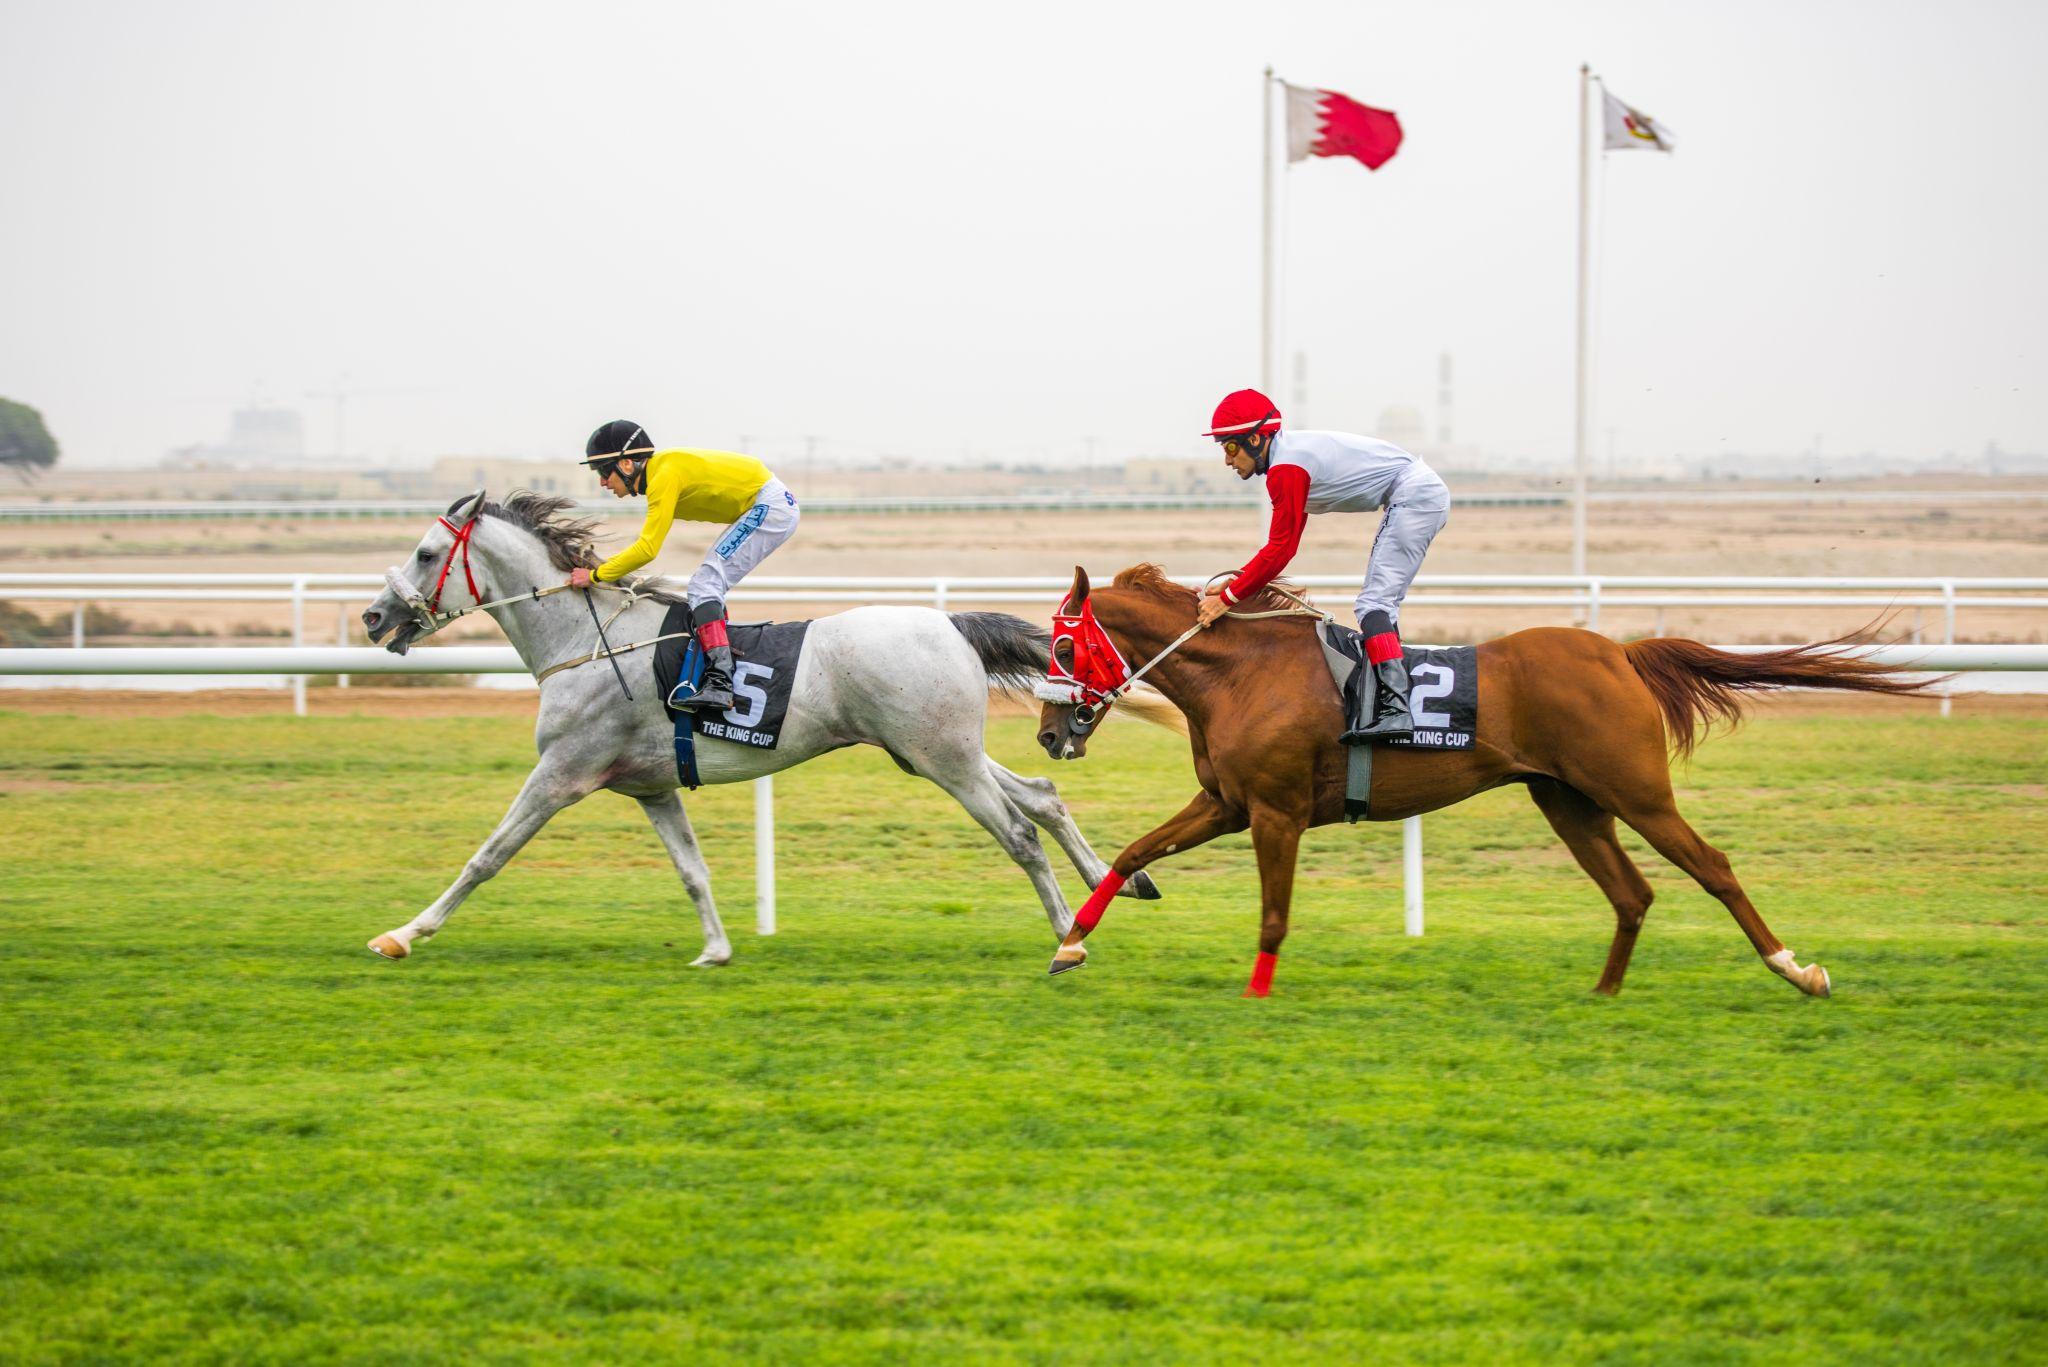 Horse Racing Complex, Bahrain